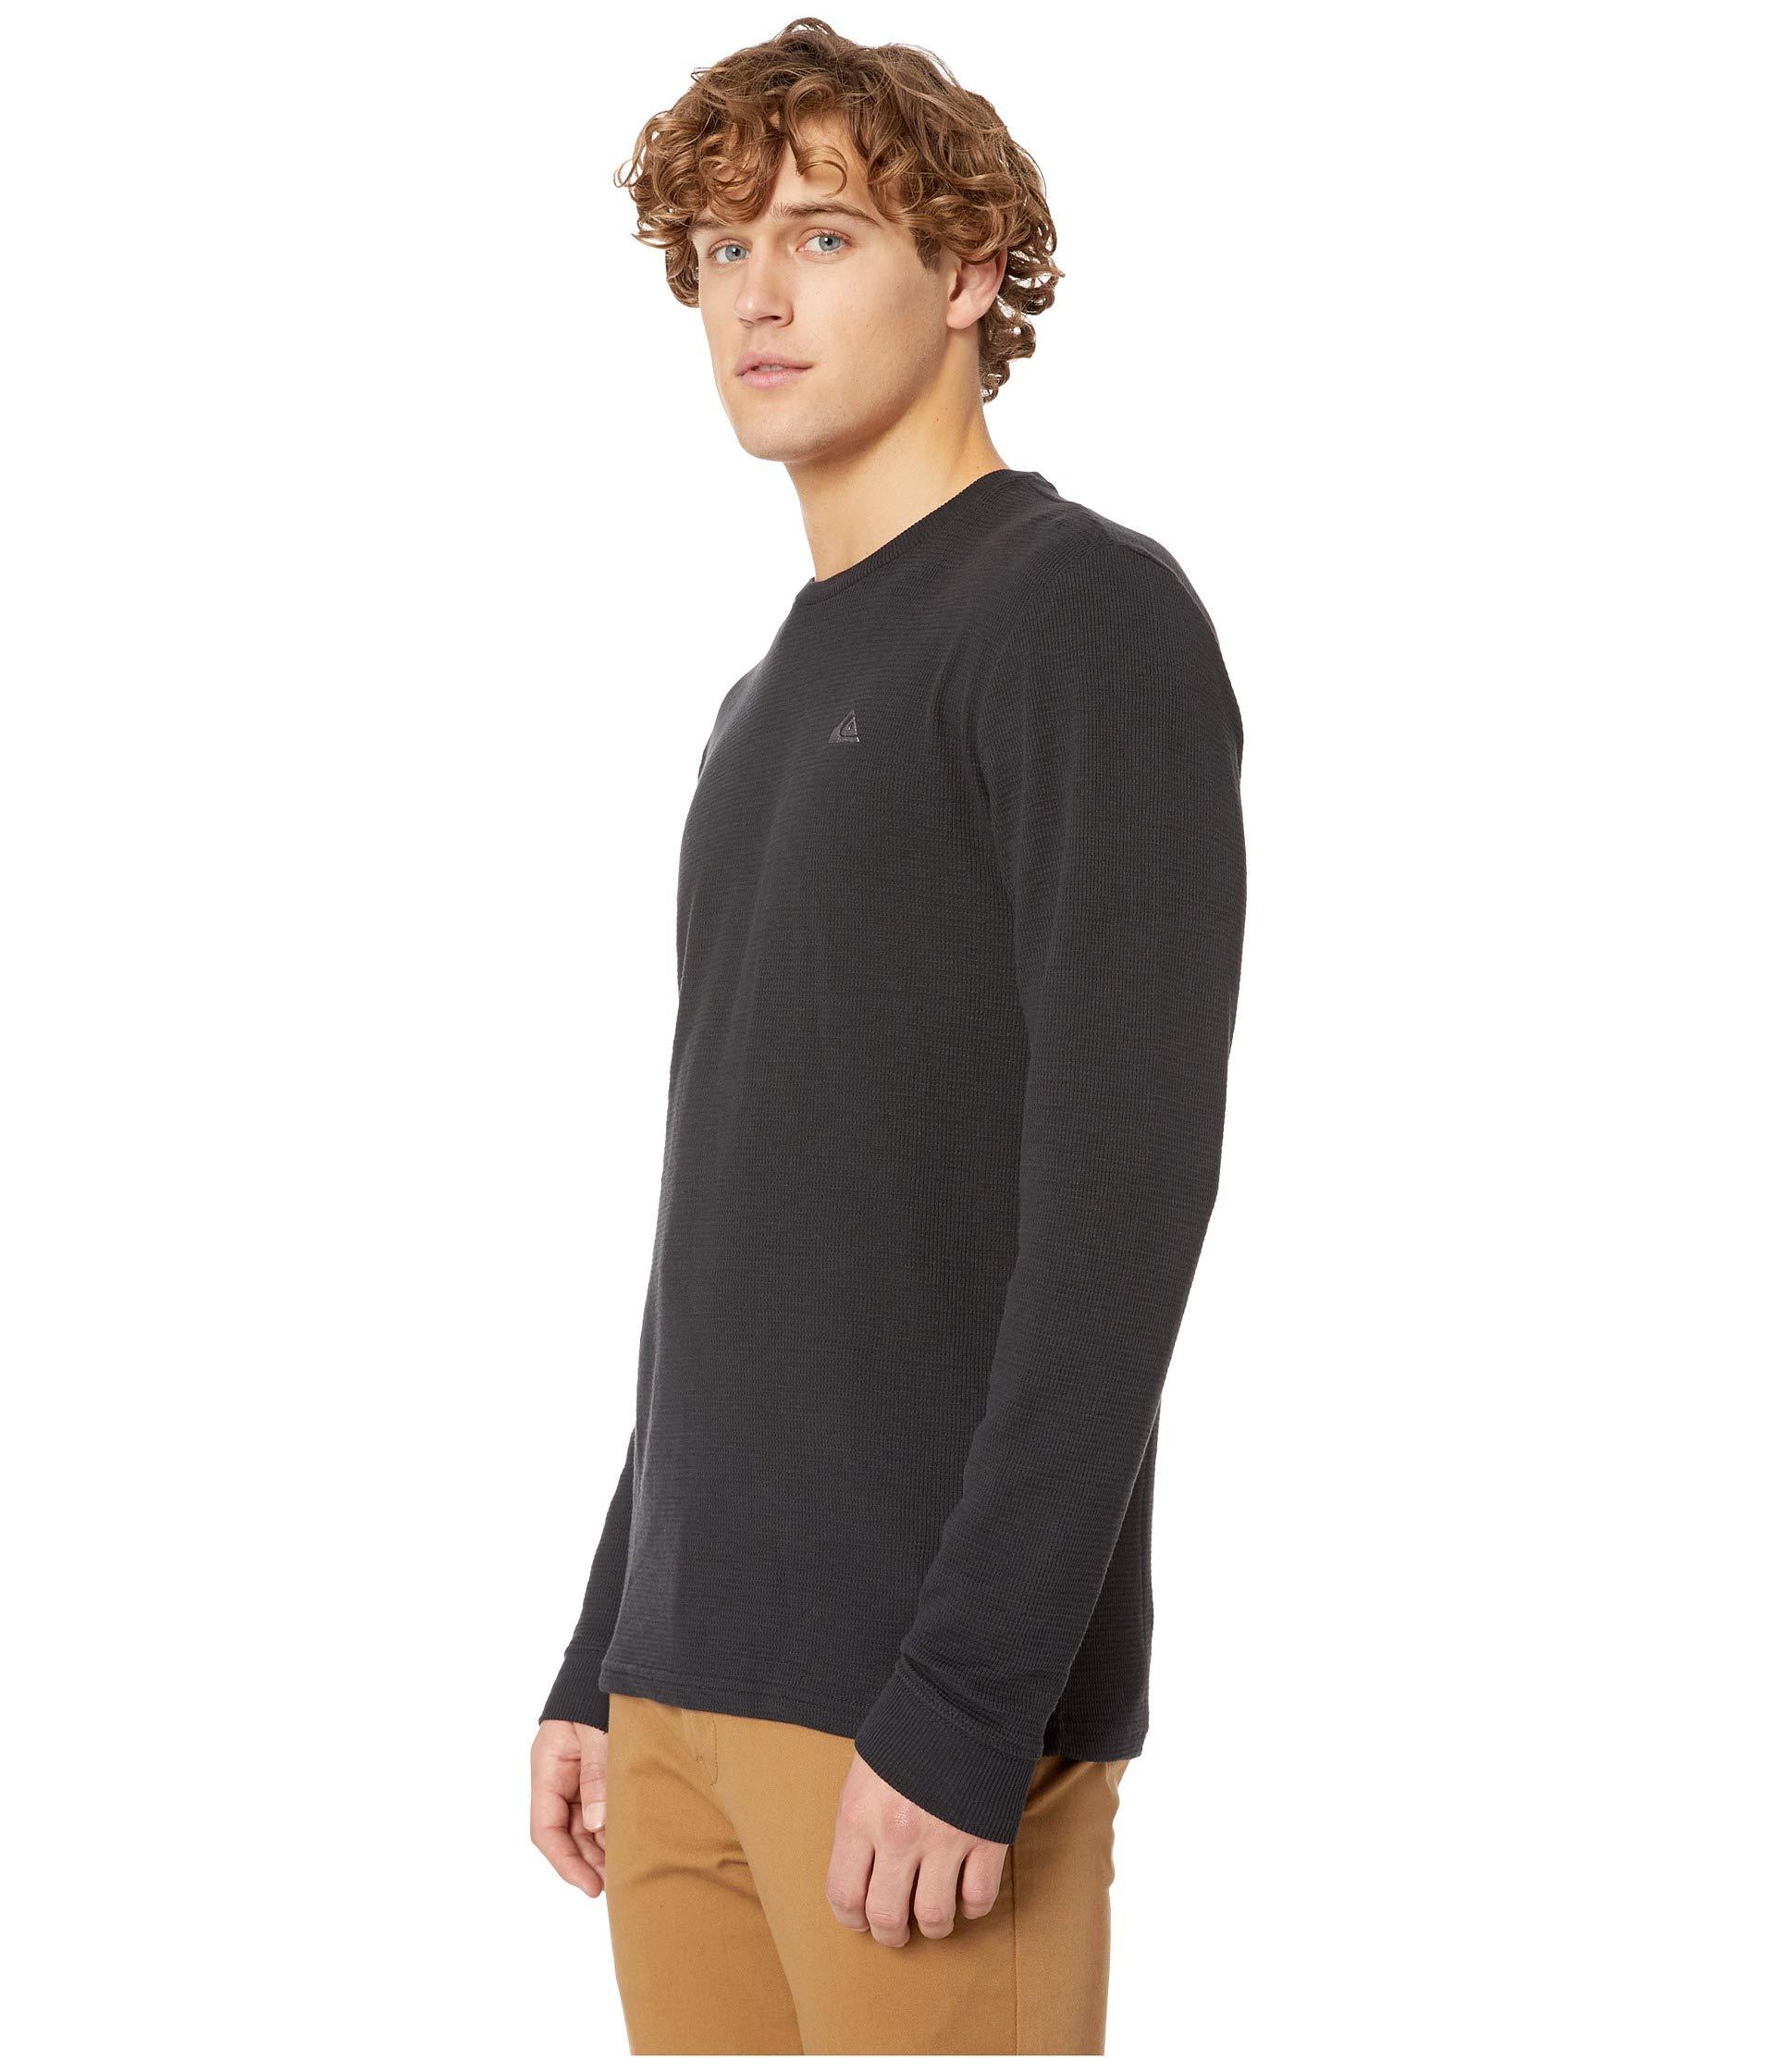 Sleeve Long Stitch Comp Black Quiksilver wPE5tqY